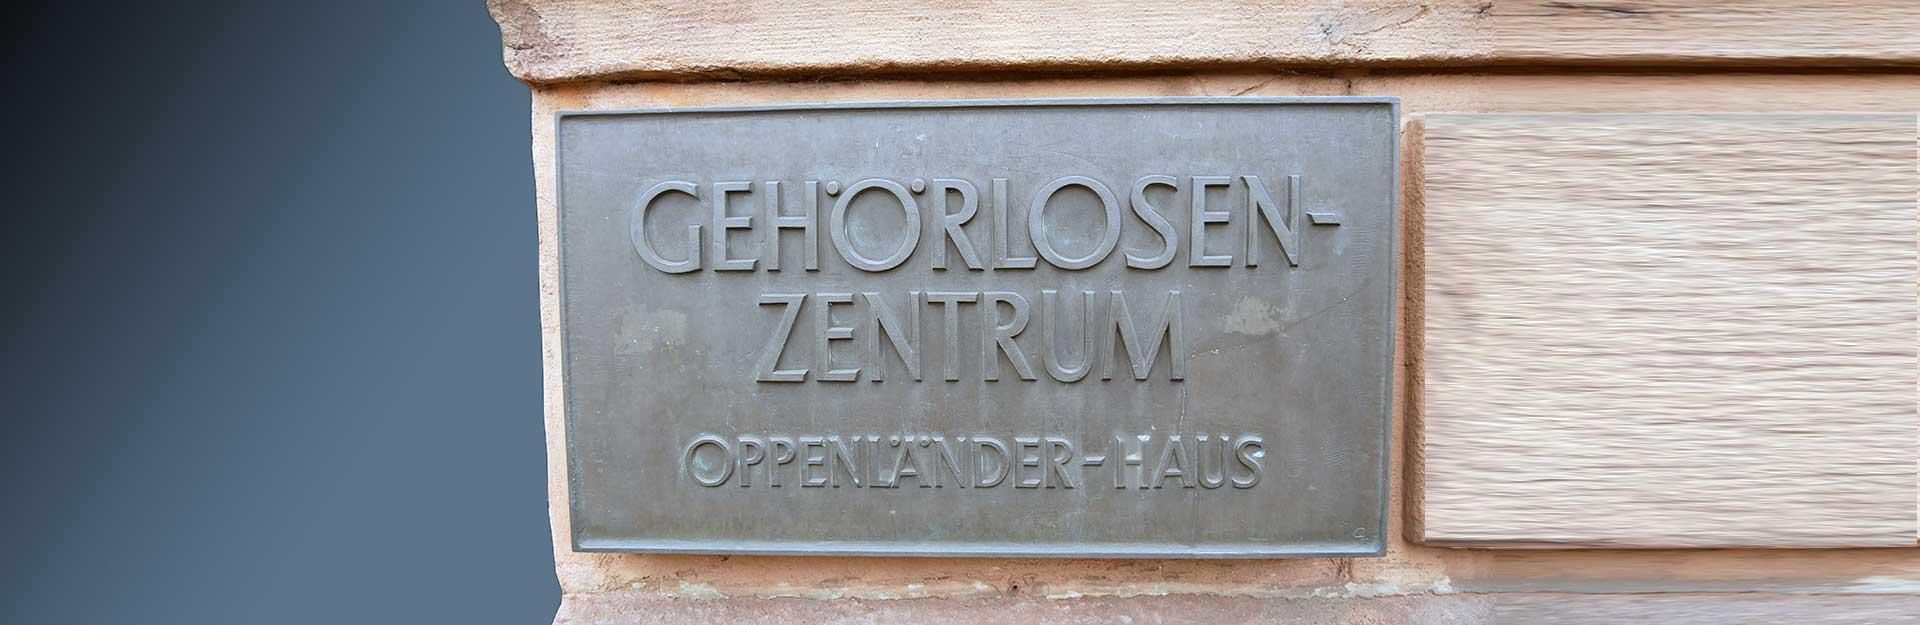 Landesverband der Gehörlosen Baden-Württemberg e.V.